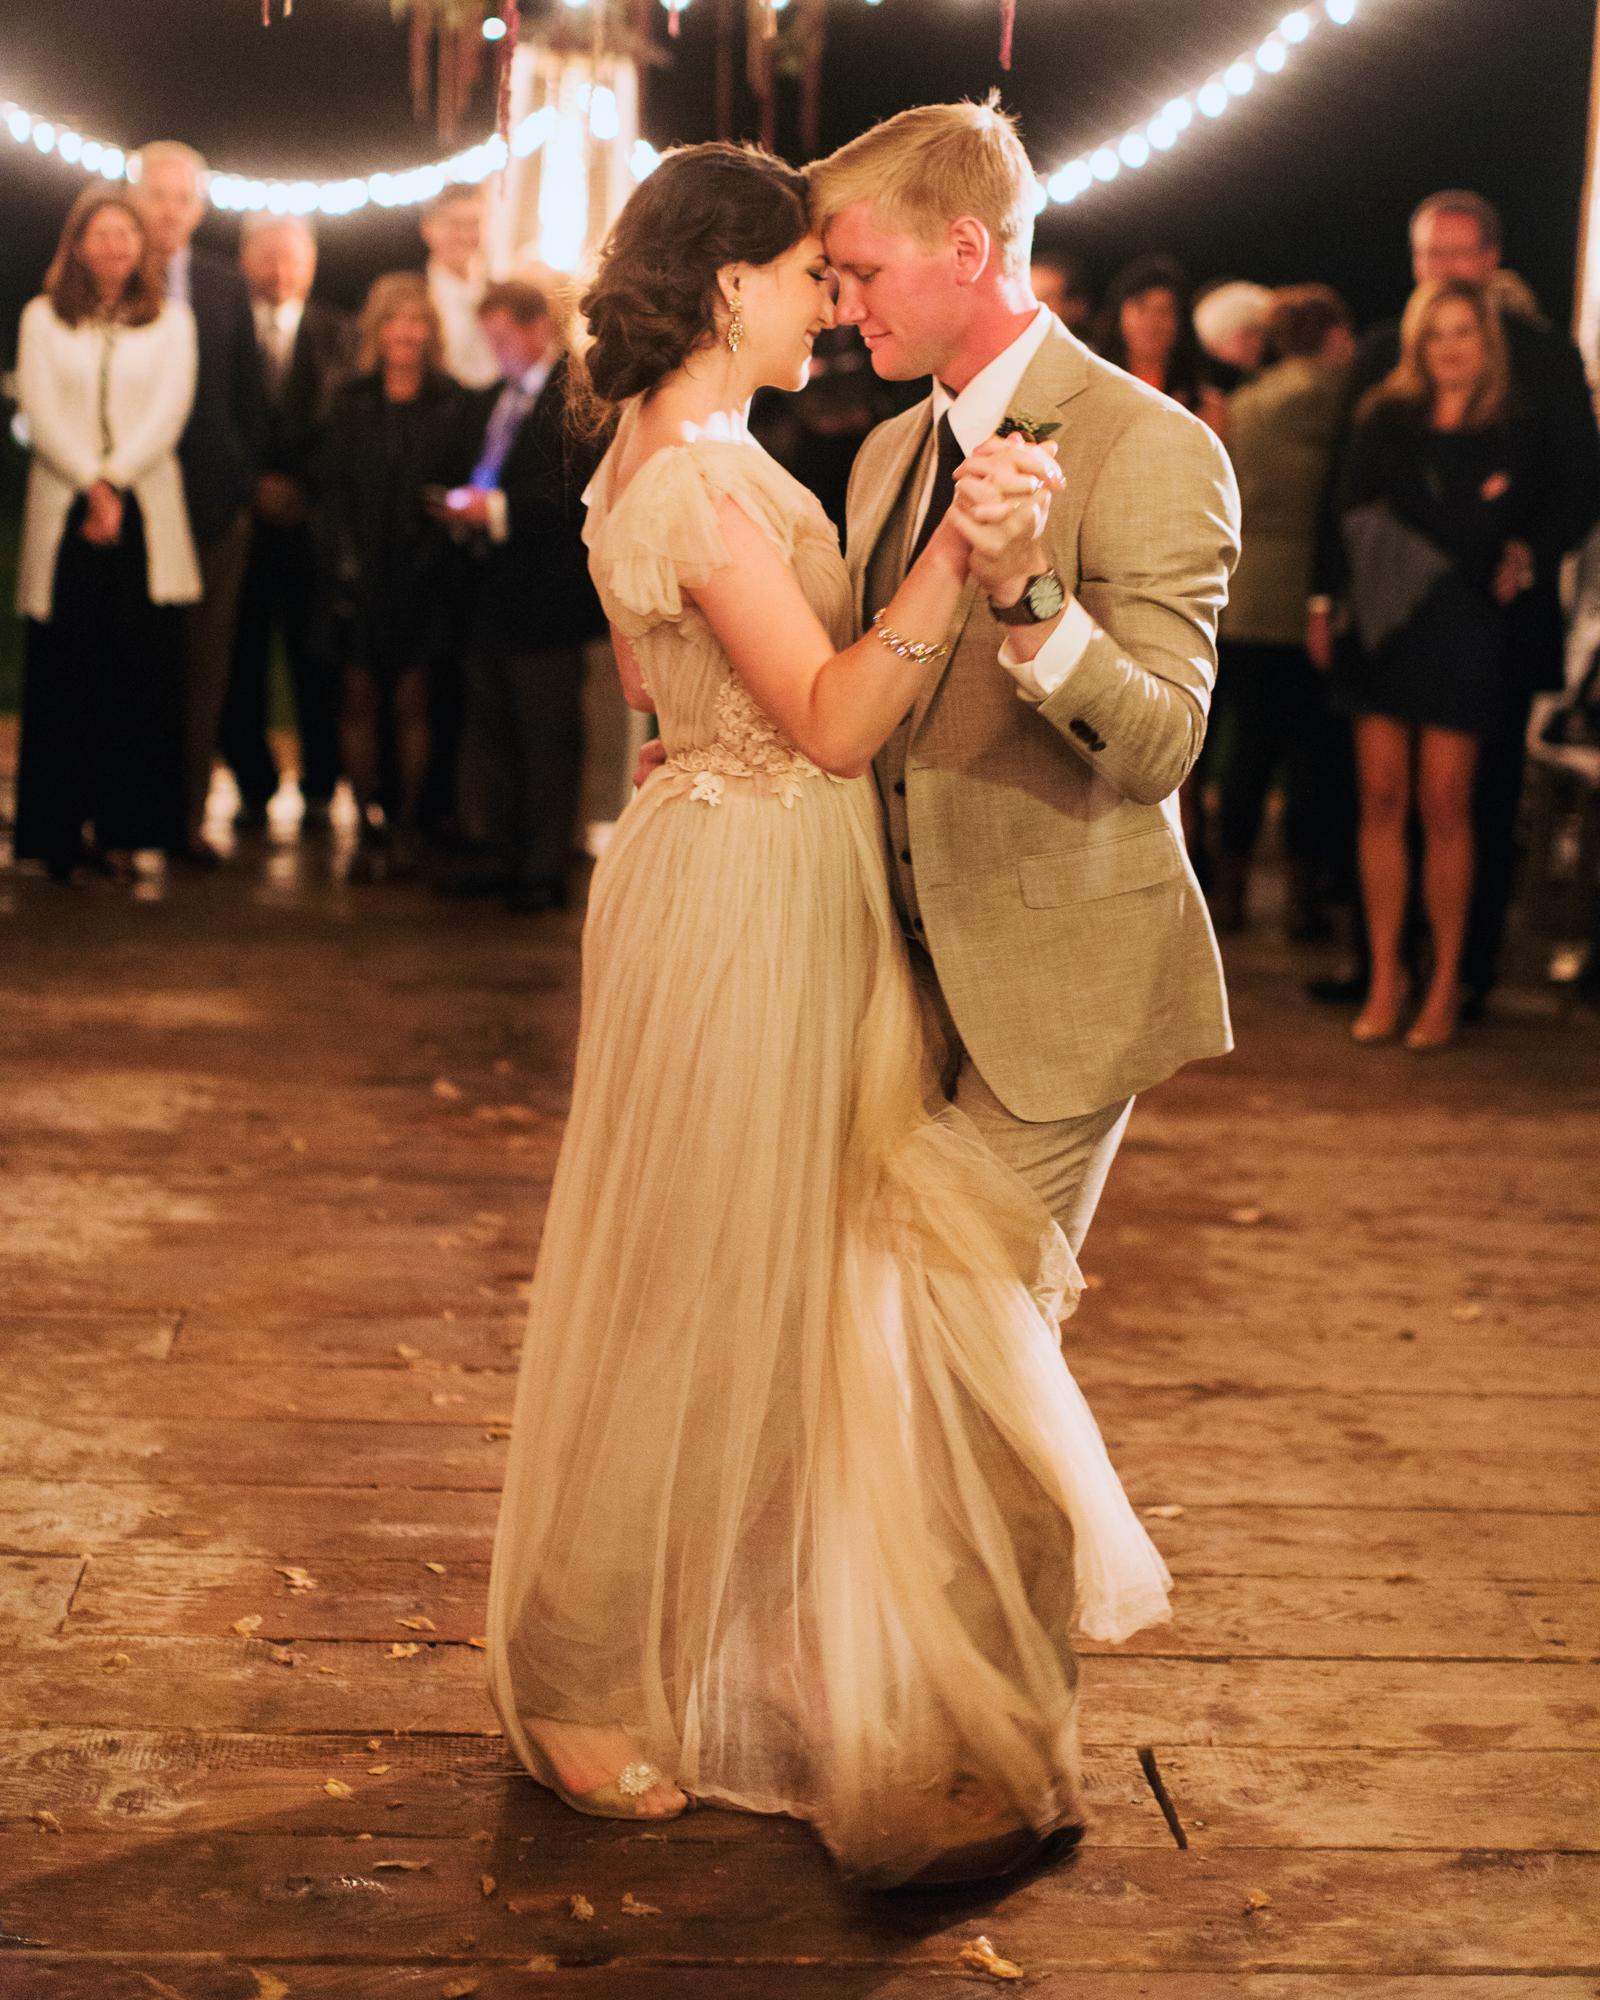 sara-matt-firstdance-couple-3607-s111990-0715.jpg